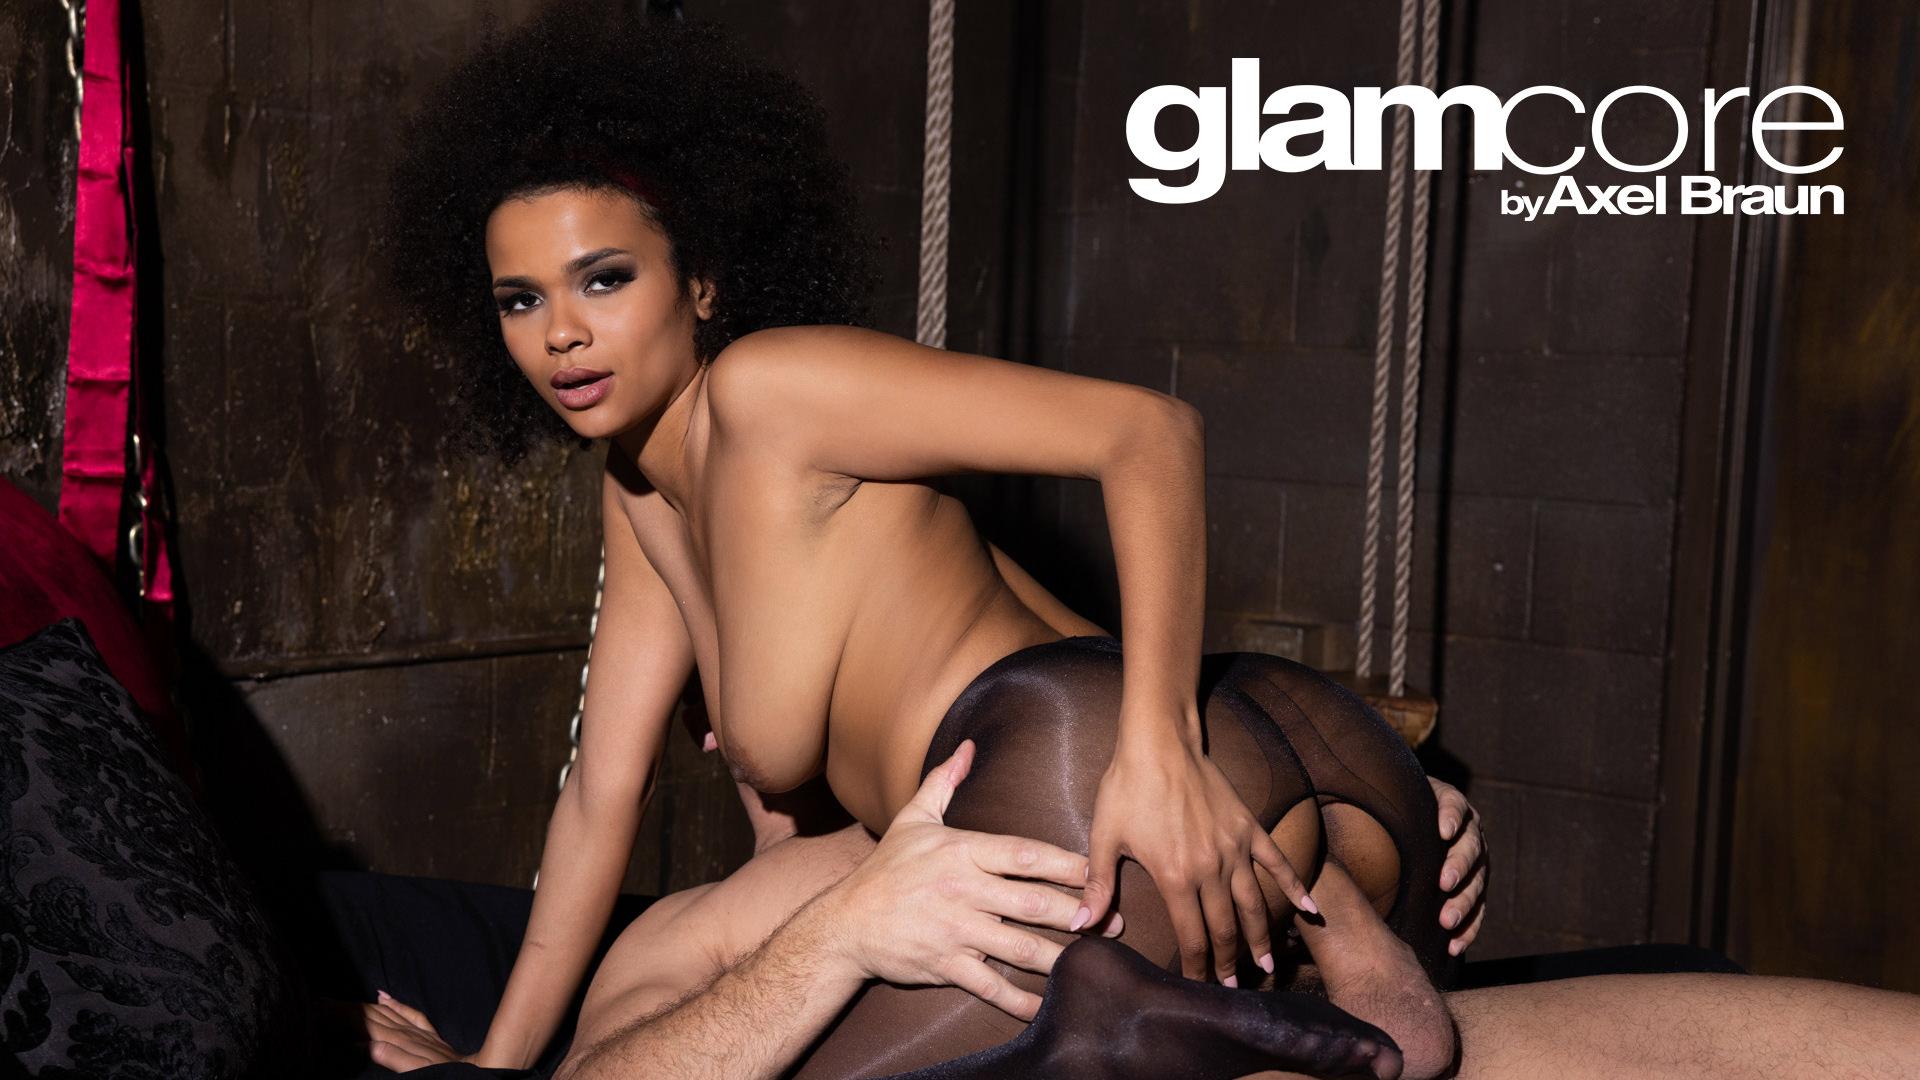 Glamcore - Scene 4